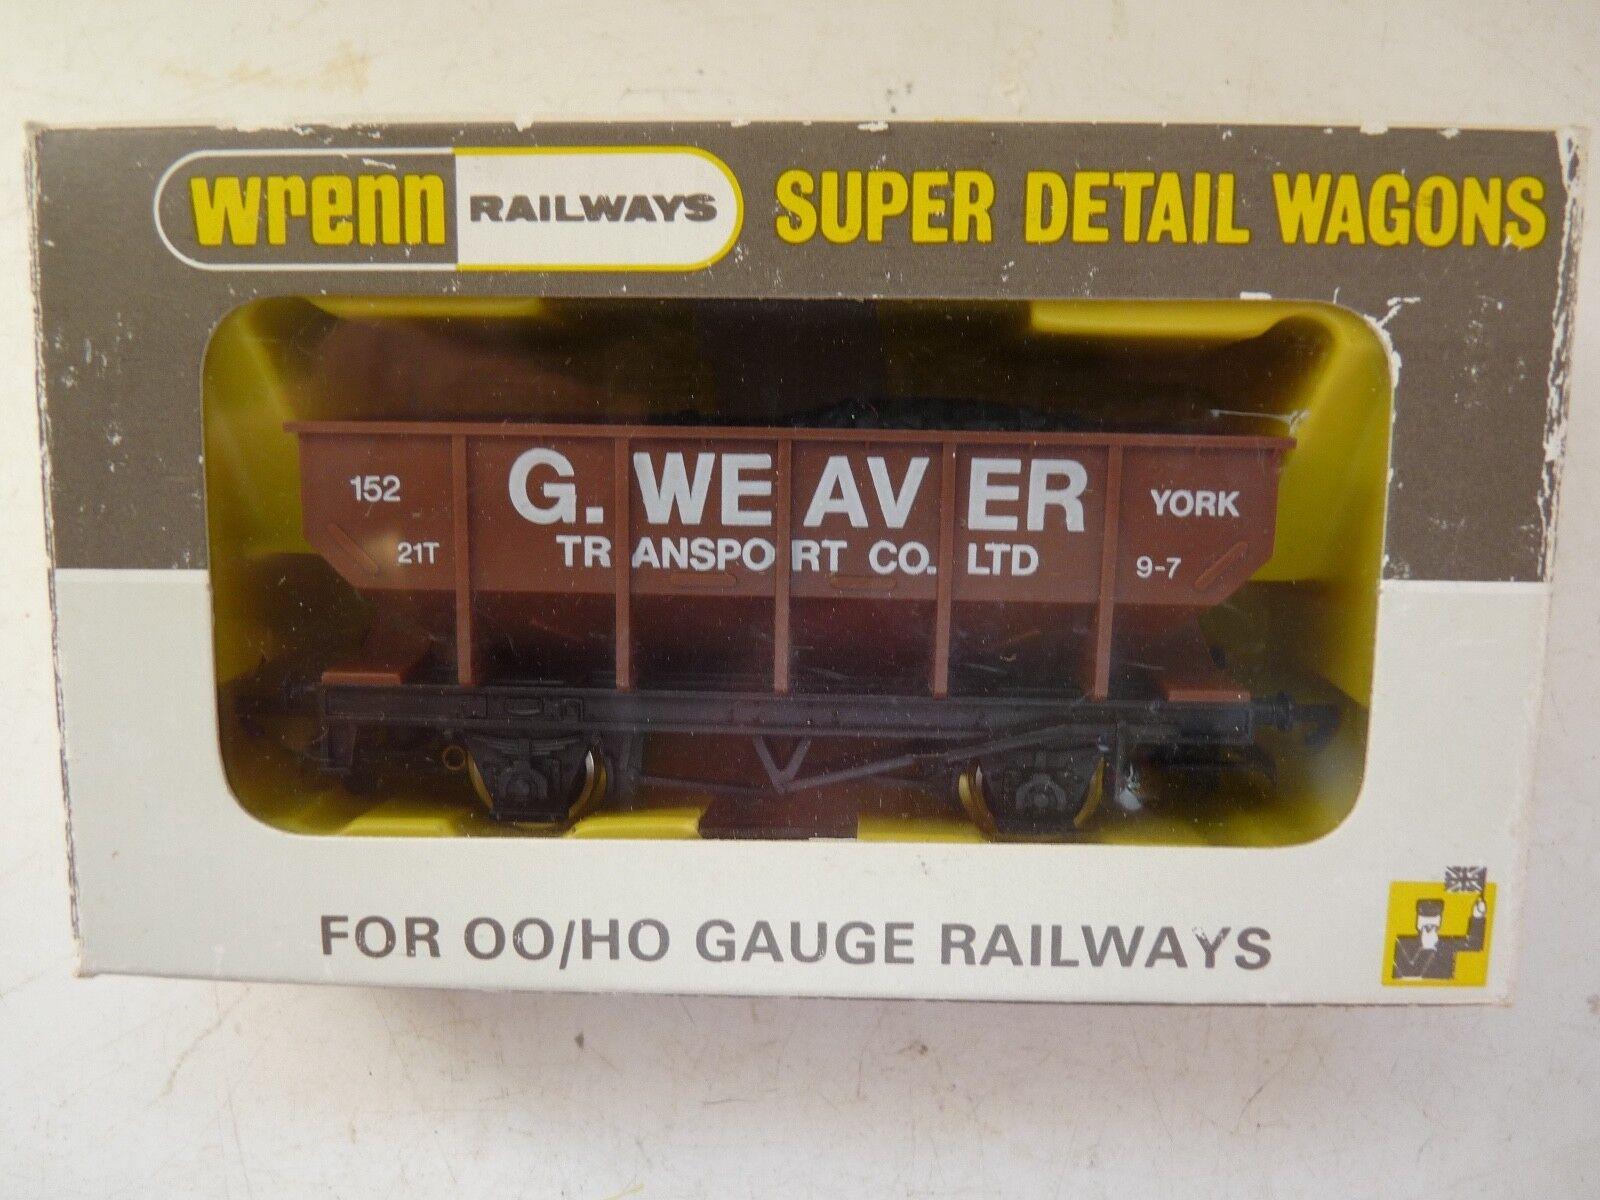 WRENN W.5502 'WEAVER TRANSPORT' 21 TON YORK MINT BOXED